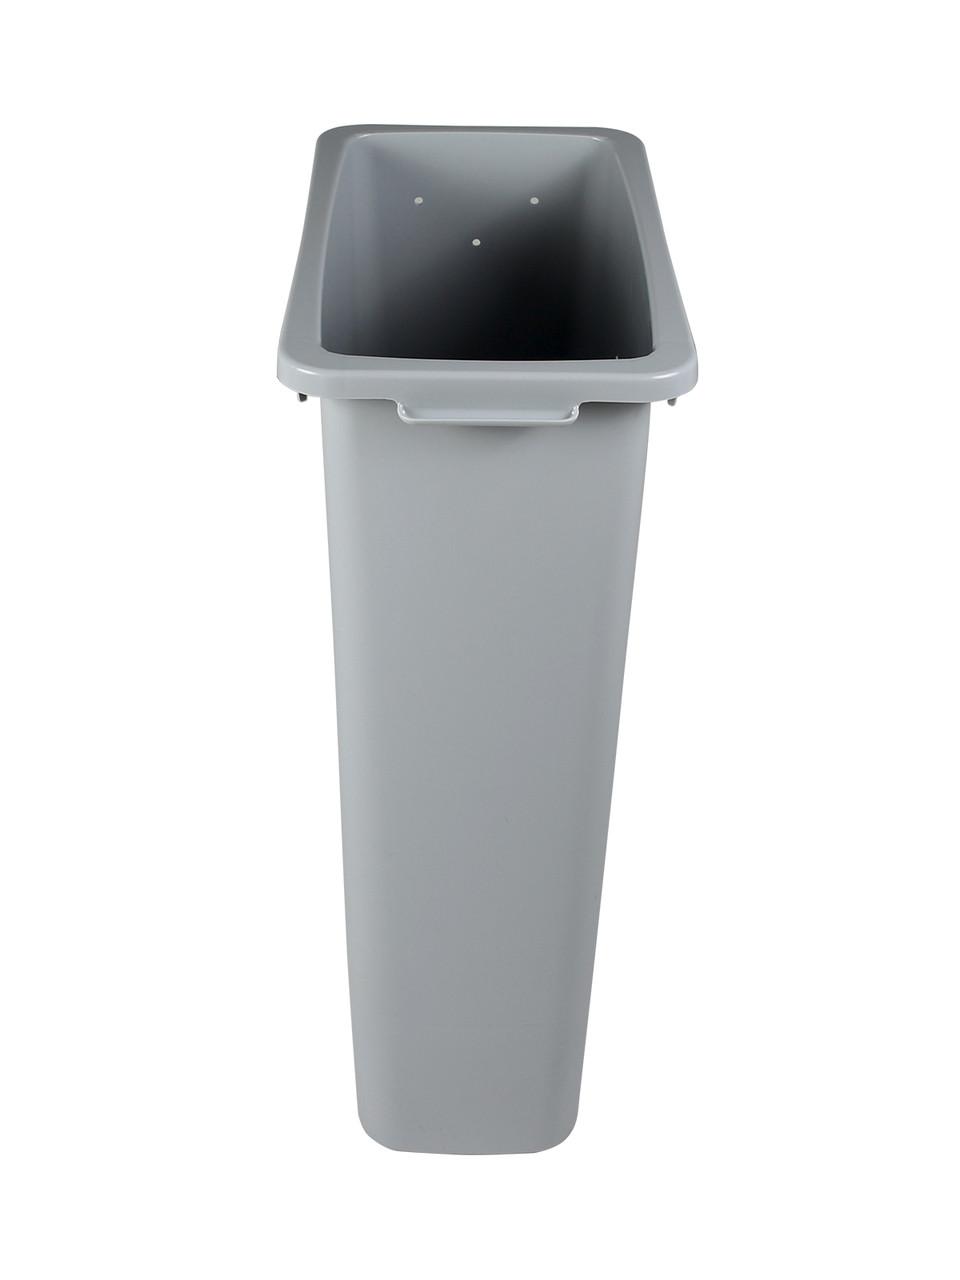 23 Gallon Skinny Plastic Home & Office Trash Can Gray